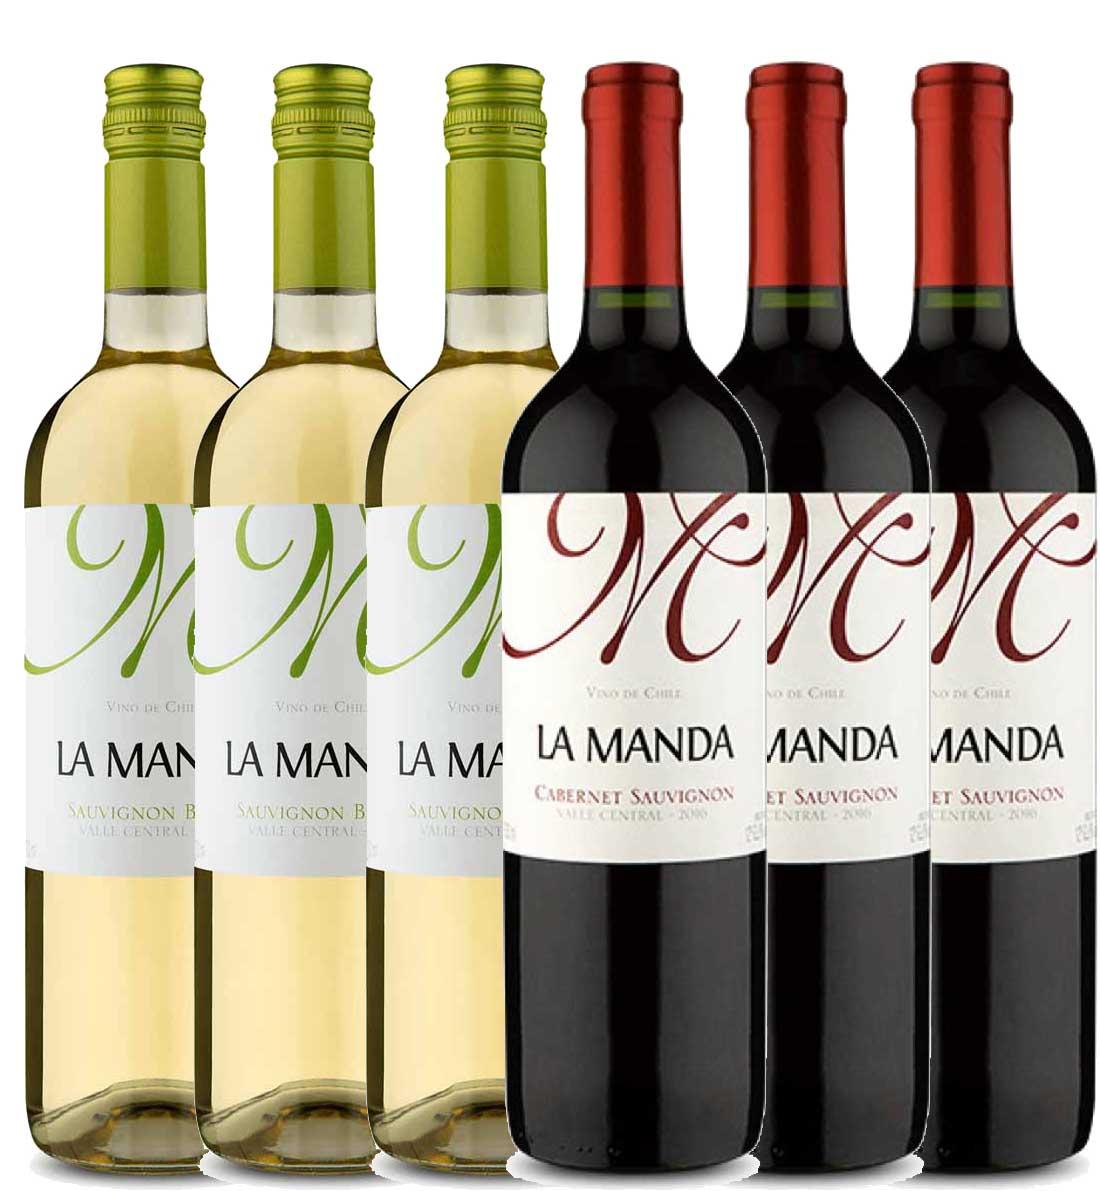 Kit 6x Vinho Tinto Chileno La Manda Cabernet Sauvignon e Sauvignon Blanc 2019